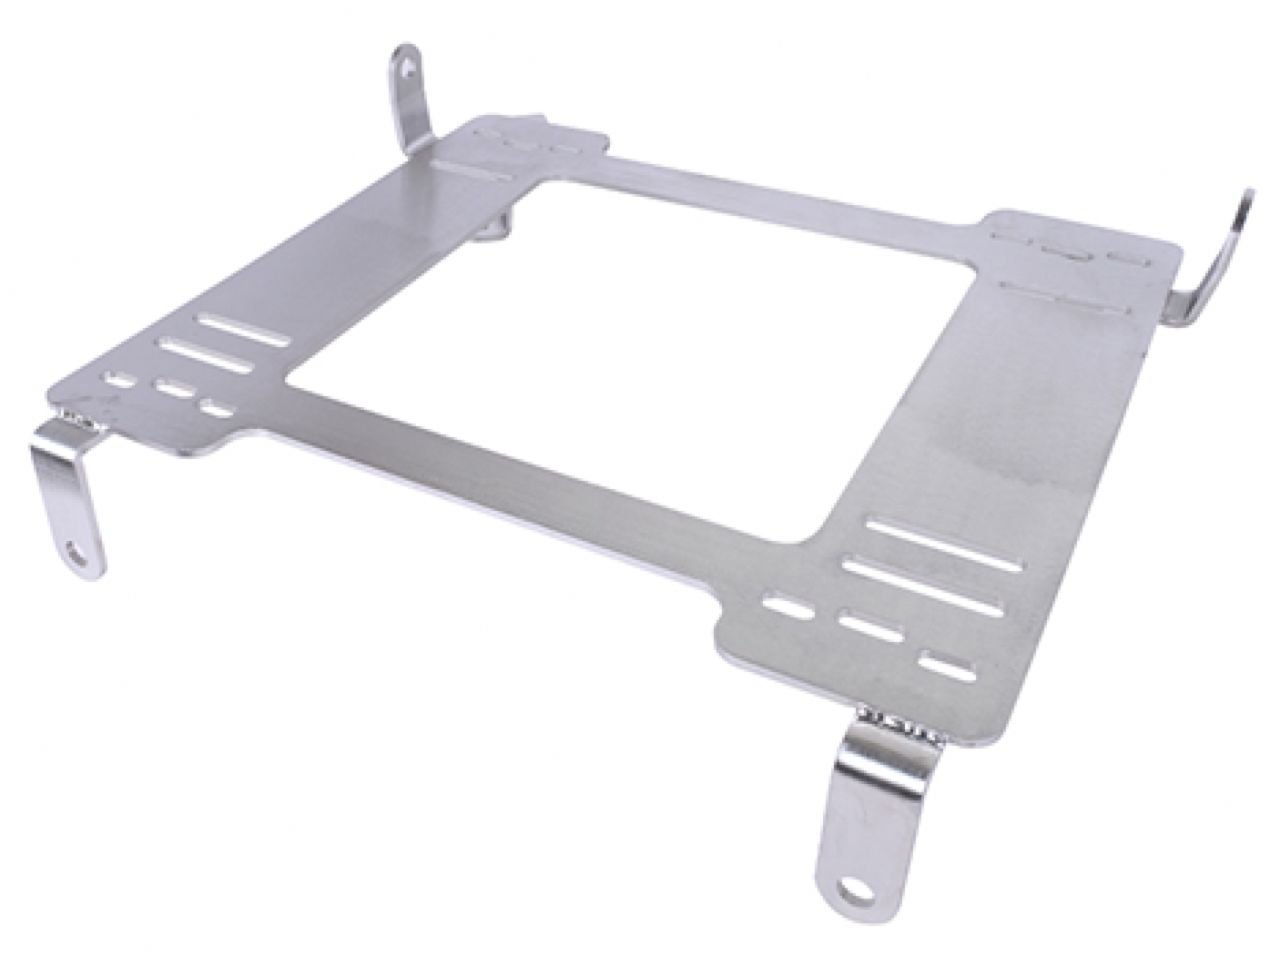 NRG Innovations SBK-HD02 Seat Bracket